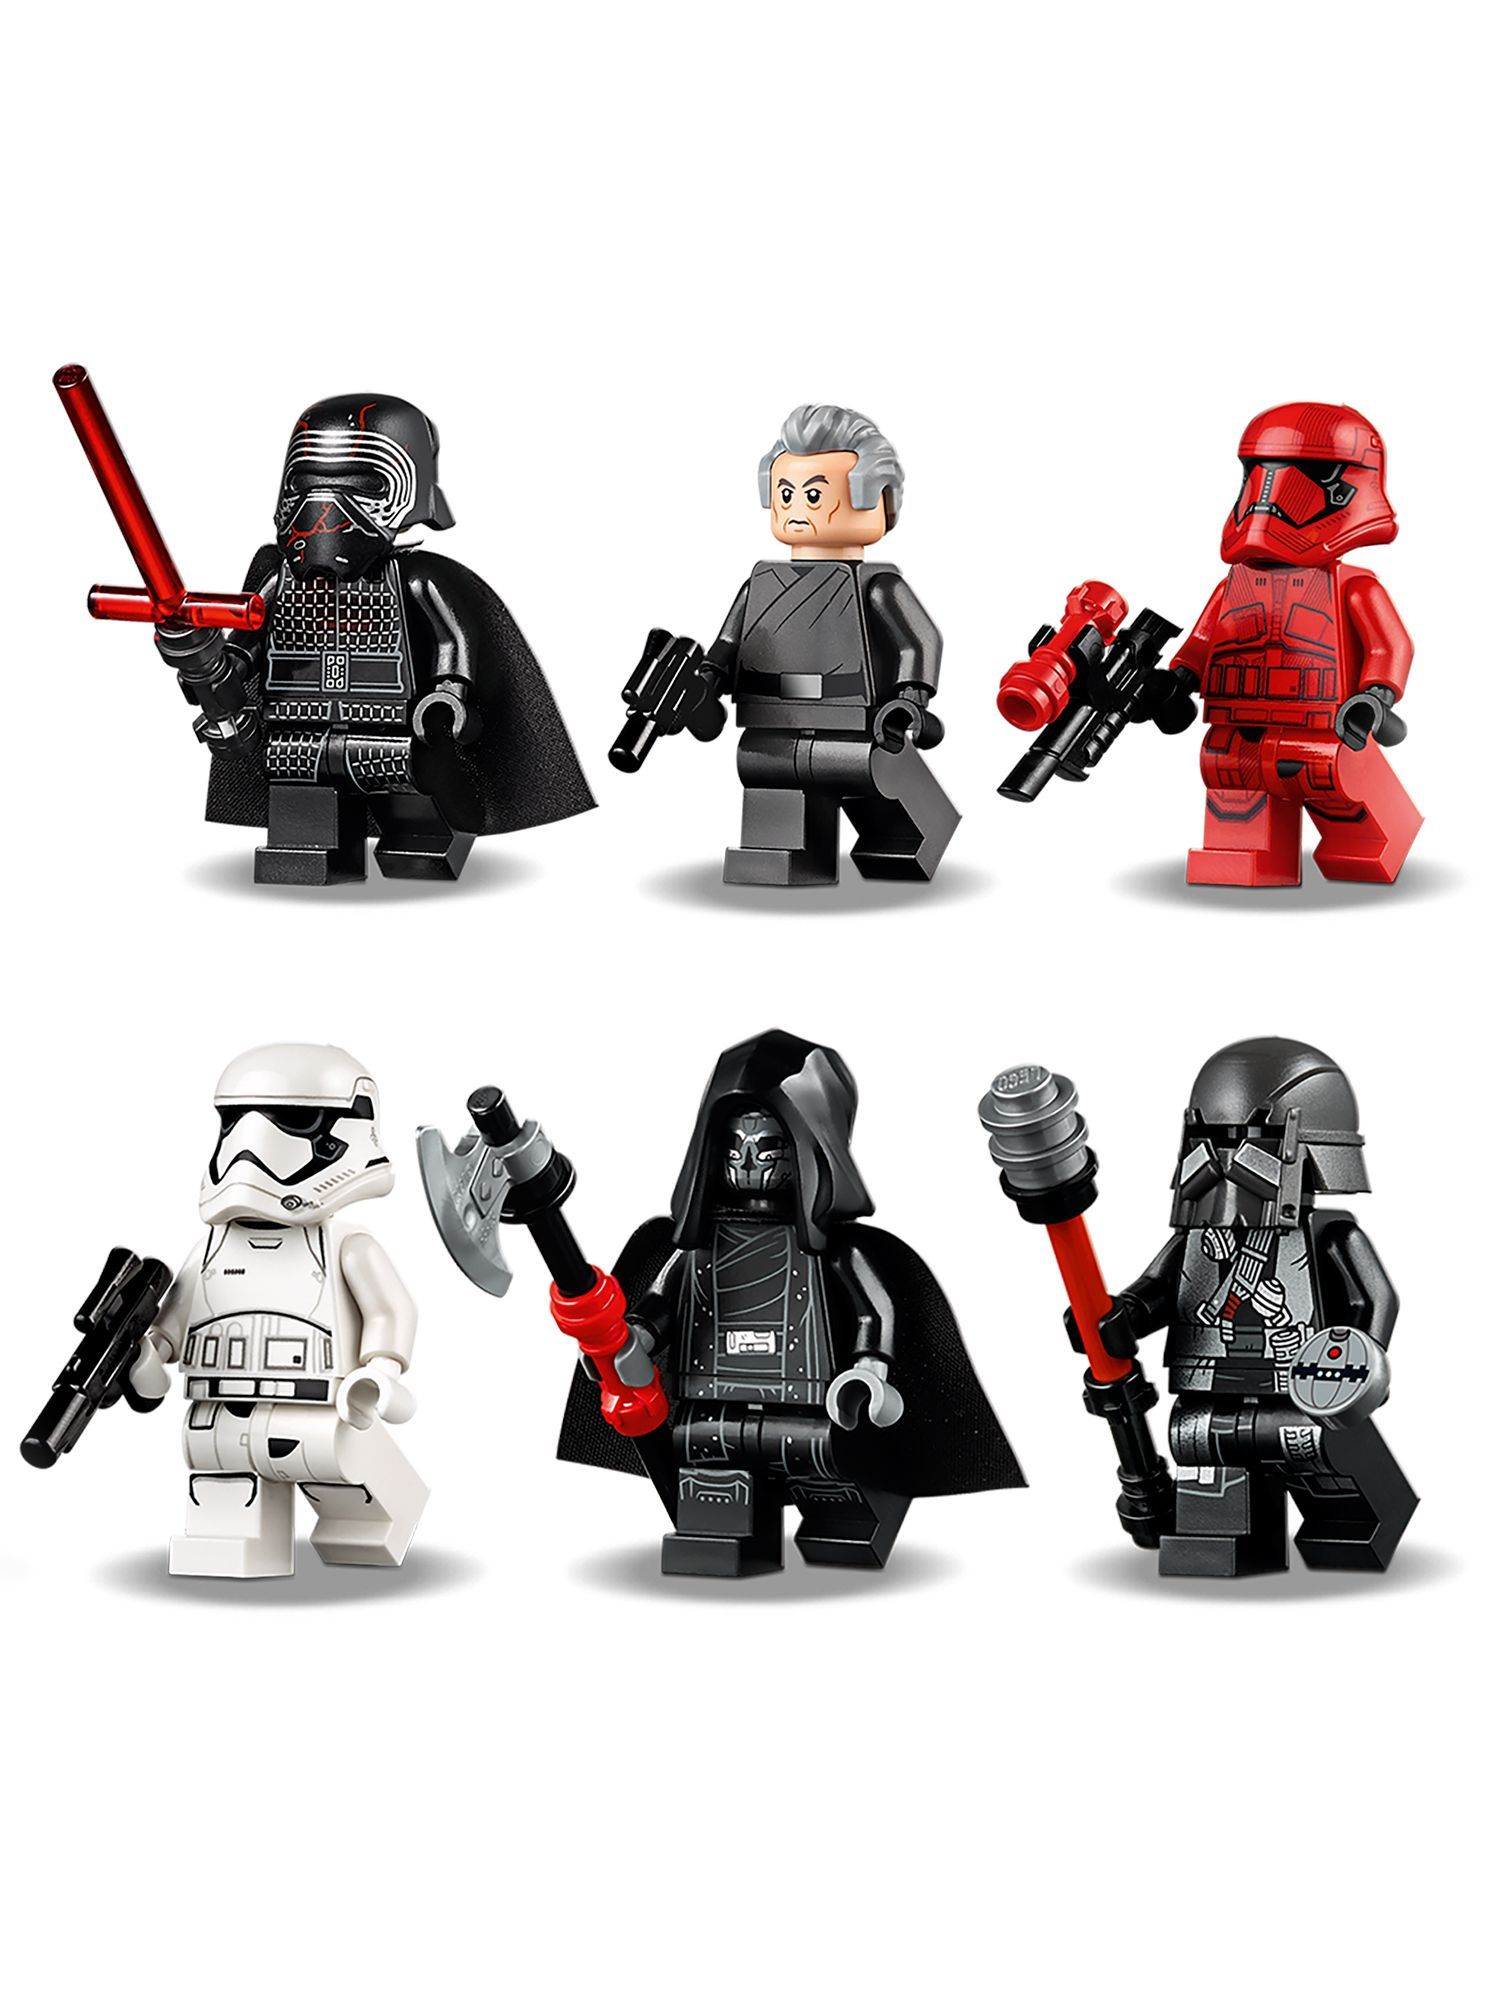 Lego Star Wars 75256 Kylo Ren S Shuttle In 2020 Lego Star Wars Lego Star Lego Star Wars Sets